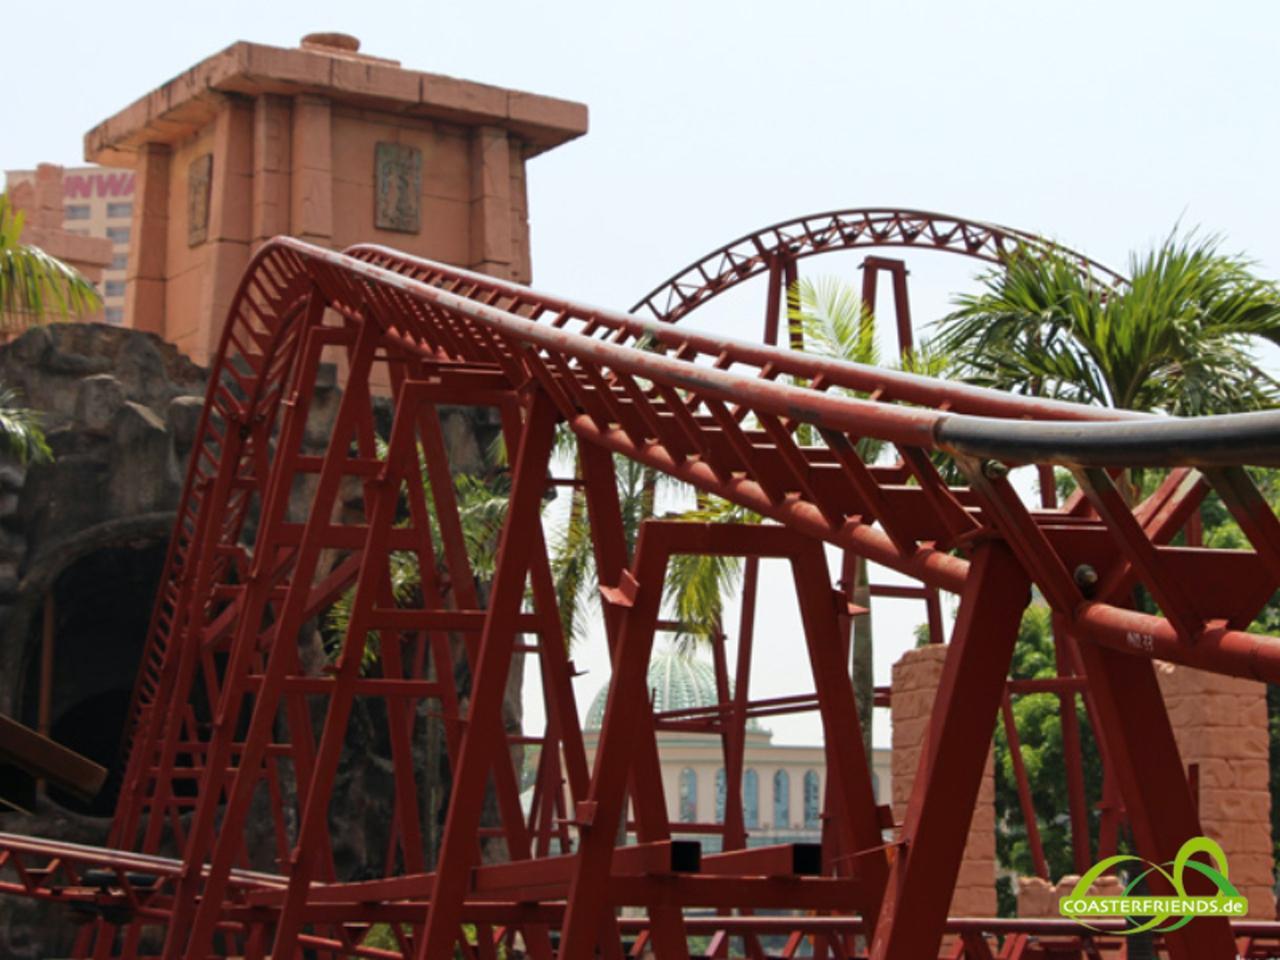 Asien - https://coasterfriends.de/joomla//images/pcp_parkdetails/asien/o2742_sunway_lagoon/content2.jpg